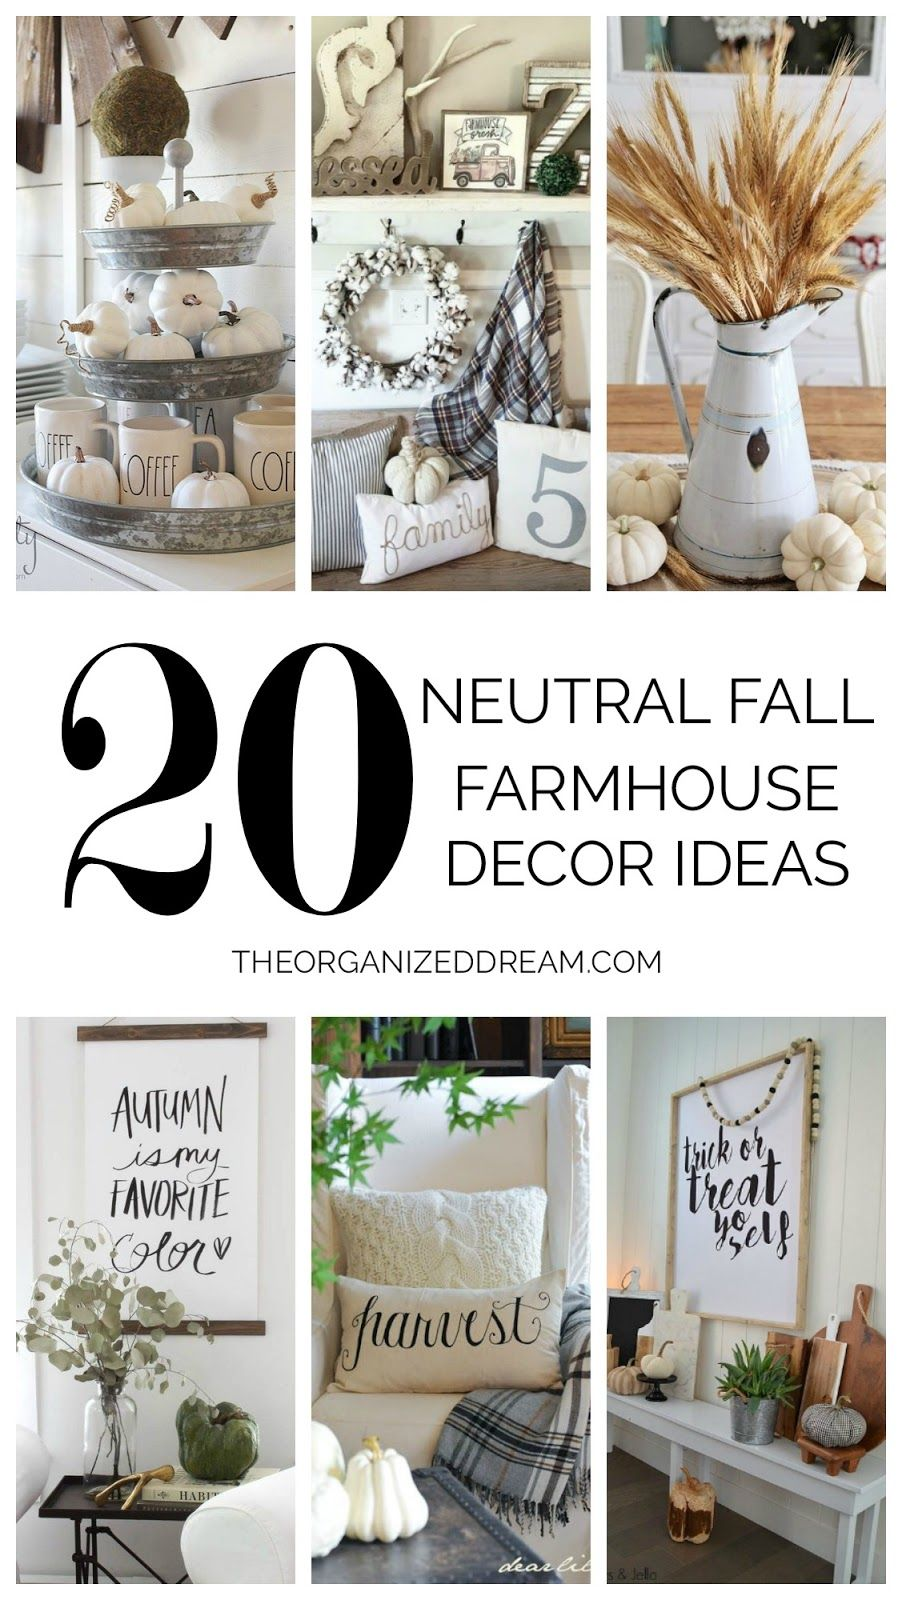 20 Neutral Fall Farmhouse Decor Ideas | Home Decor | Pinterest ...